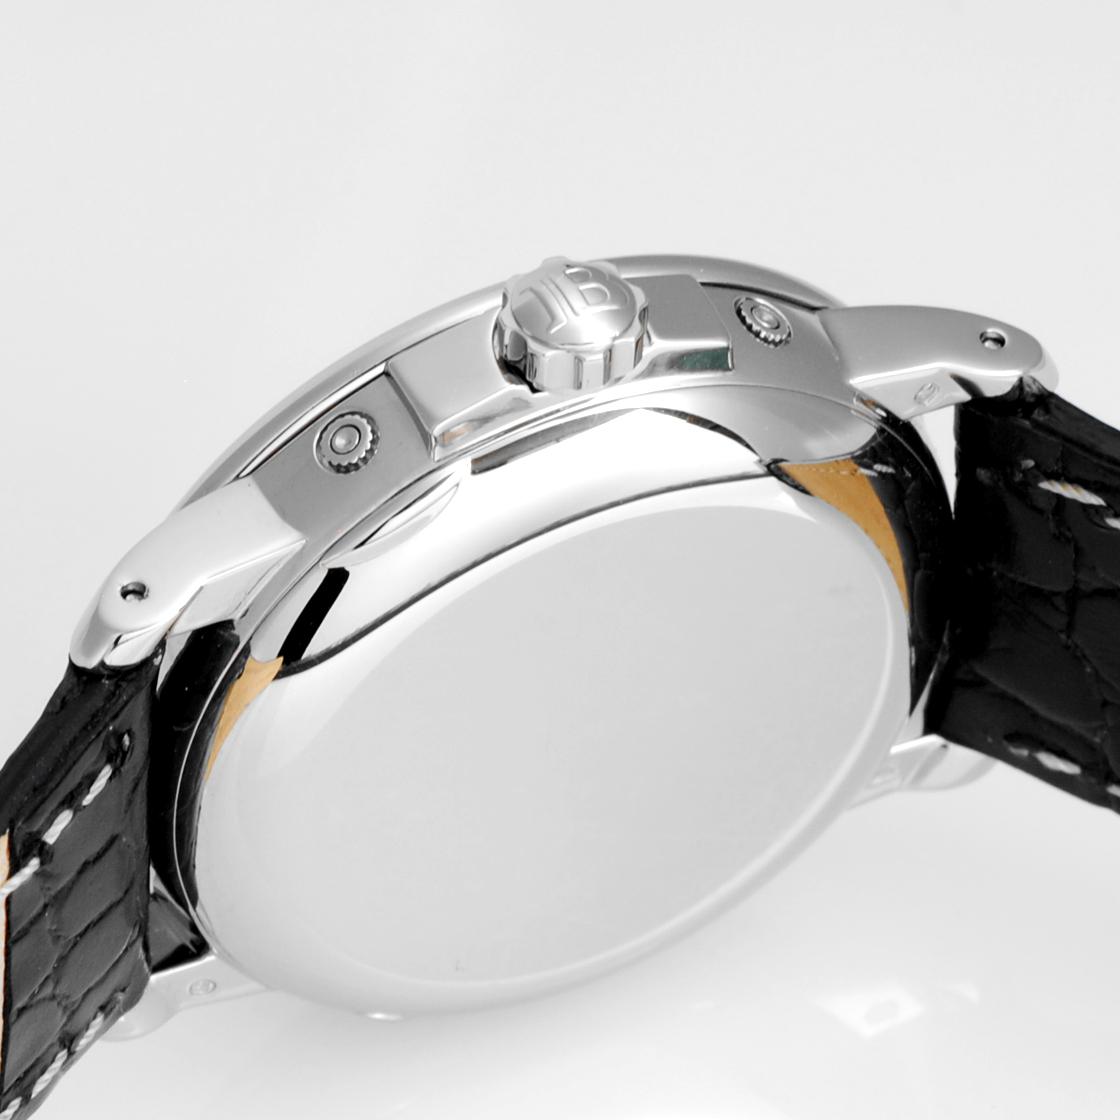 burampanremantoripurukarendamunfeizu世界250條限定獵人情况K18WG潔凈/MORELLATO公司製造皮革白表盤自動卷人3536-1542A-53《罕見的罕見的型號·皮革交換已經的!》